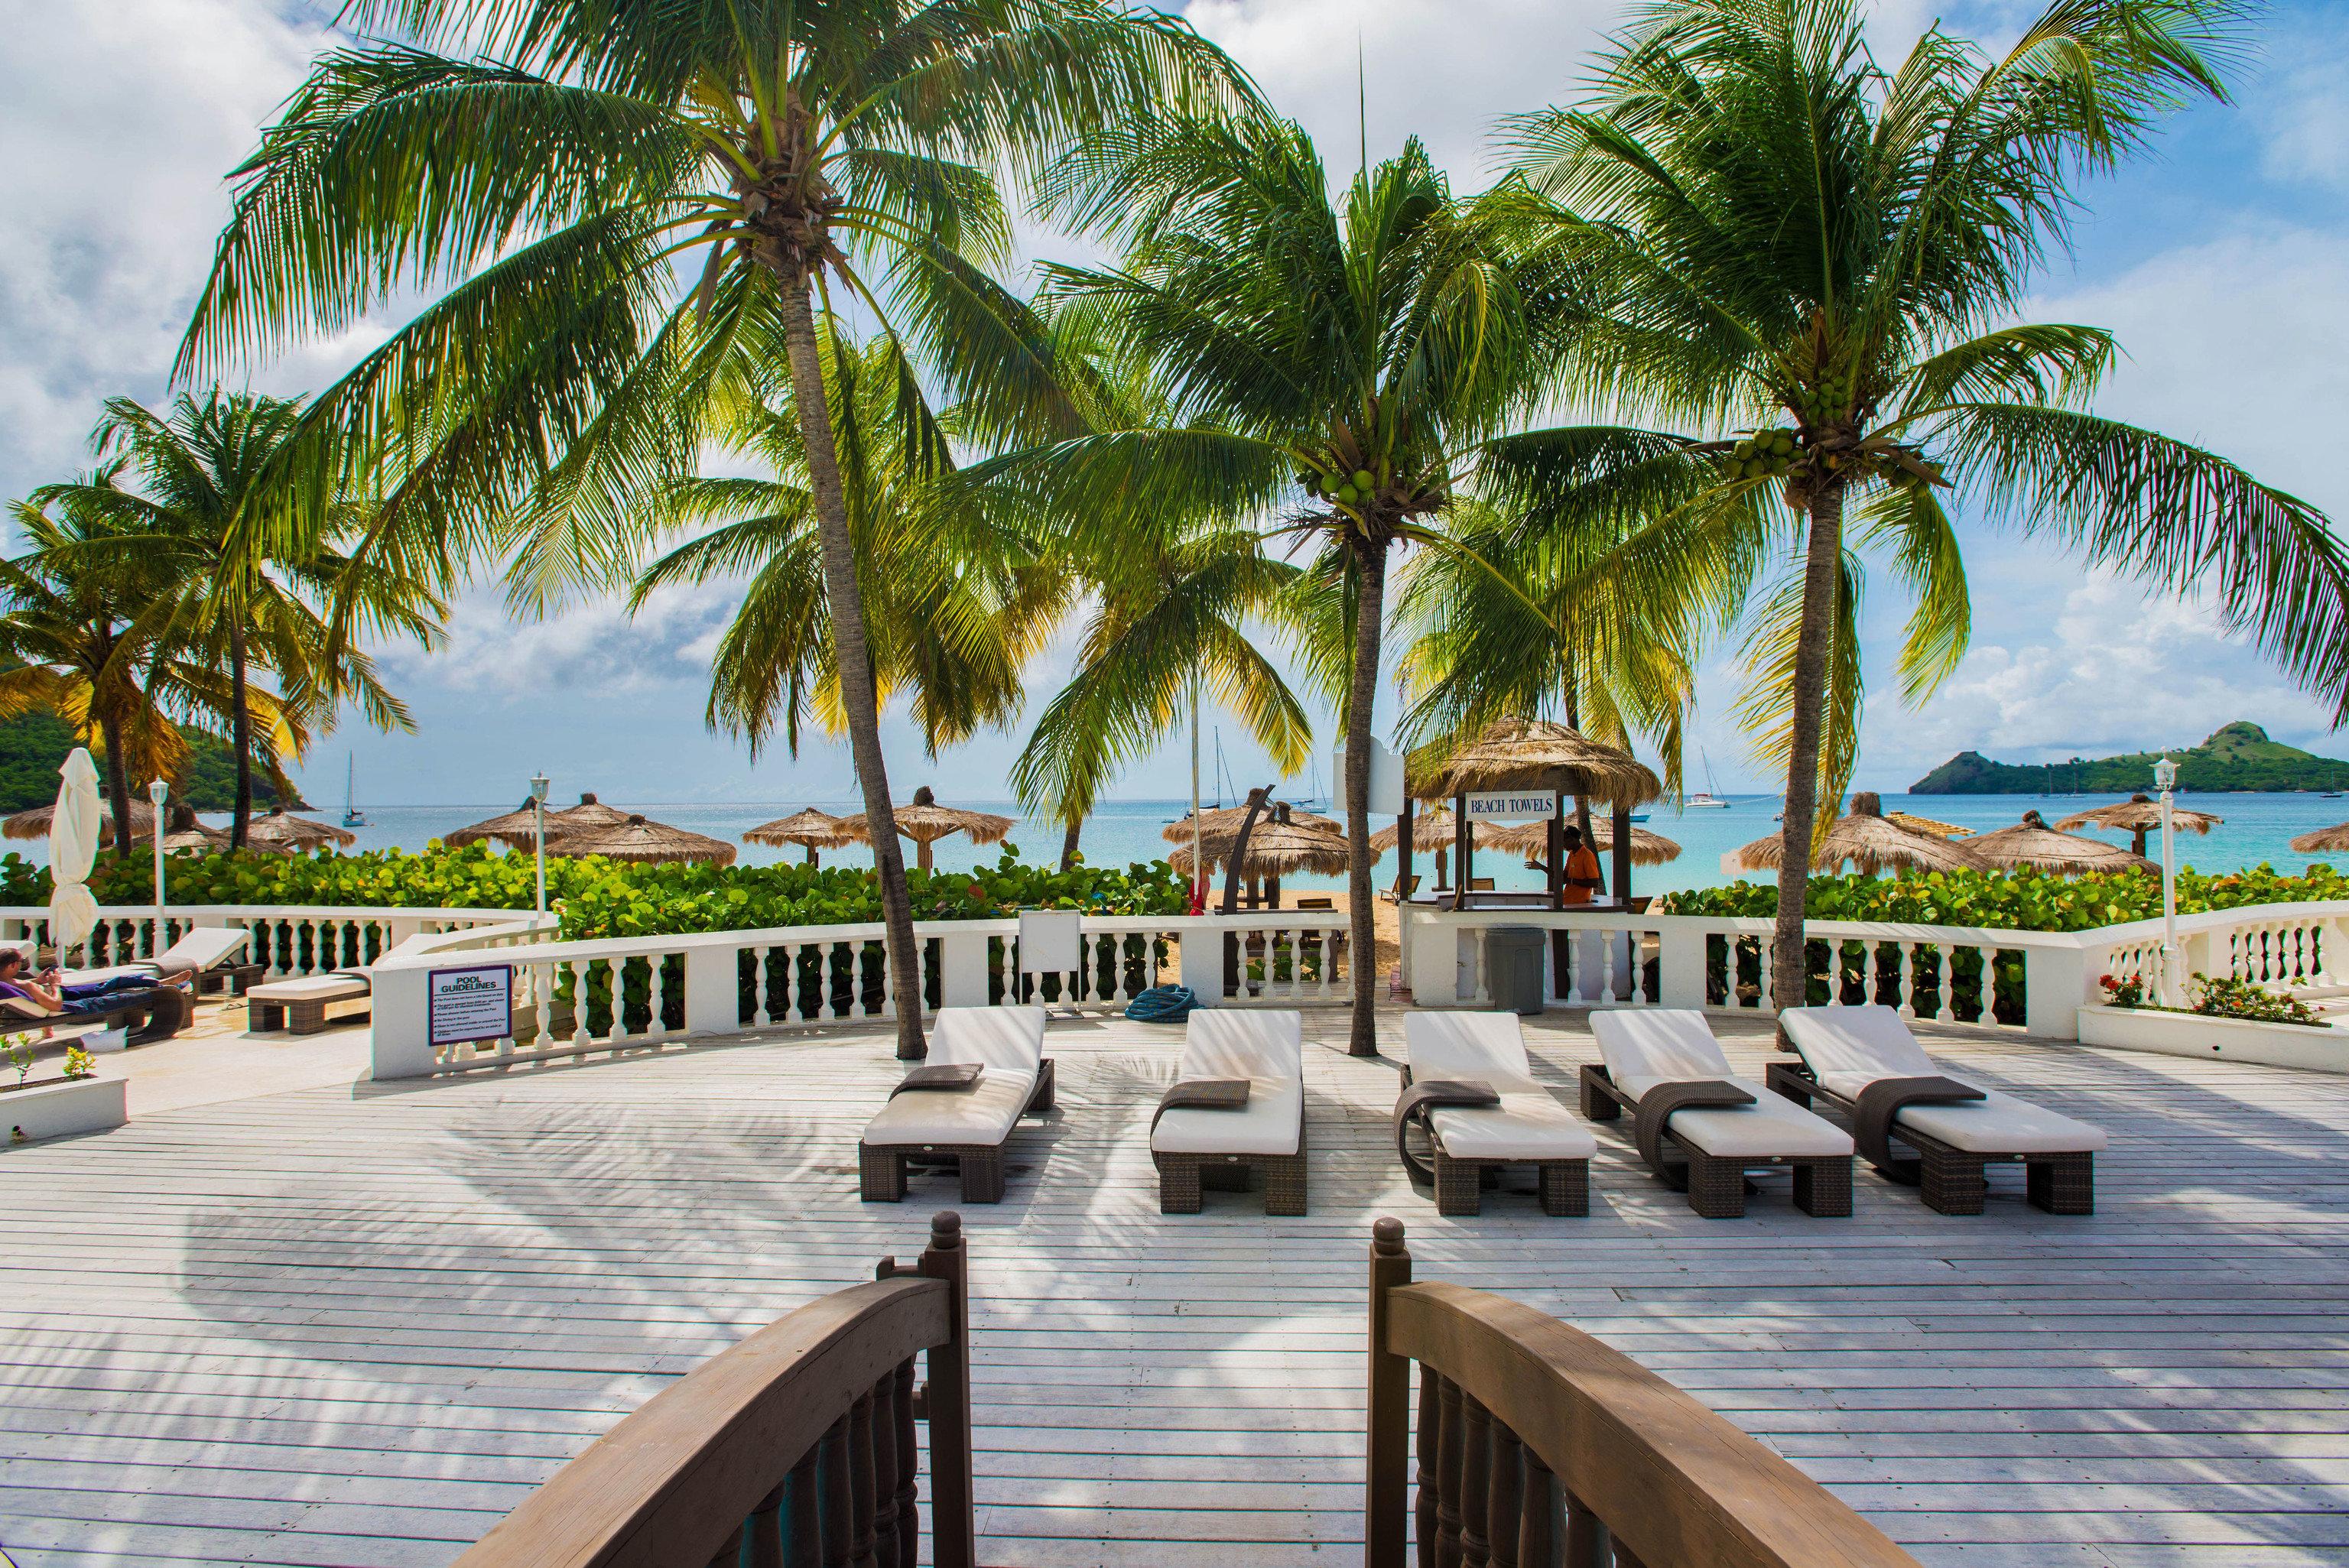 tree palm sky ground Resort swimming pool walkway arecales Beach plant caribbean palm family boardwalk Pool lined